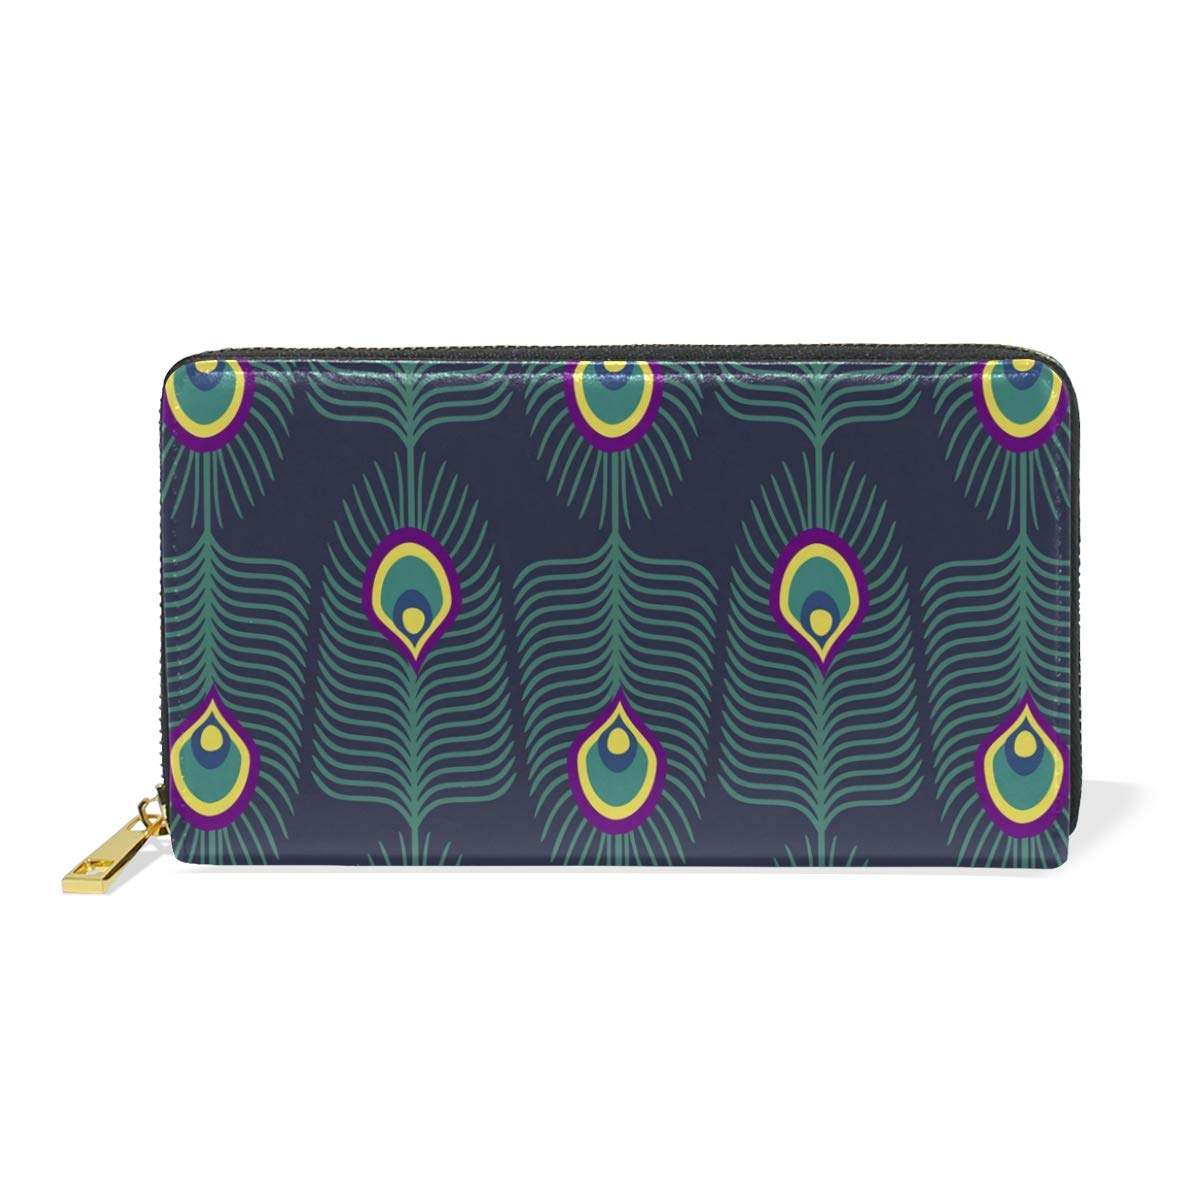 GIOVANIOR Peacock Feather Womens Clutch Purses Organizer And Handbags Zip Around Wallet